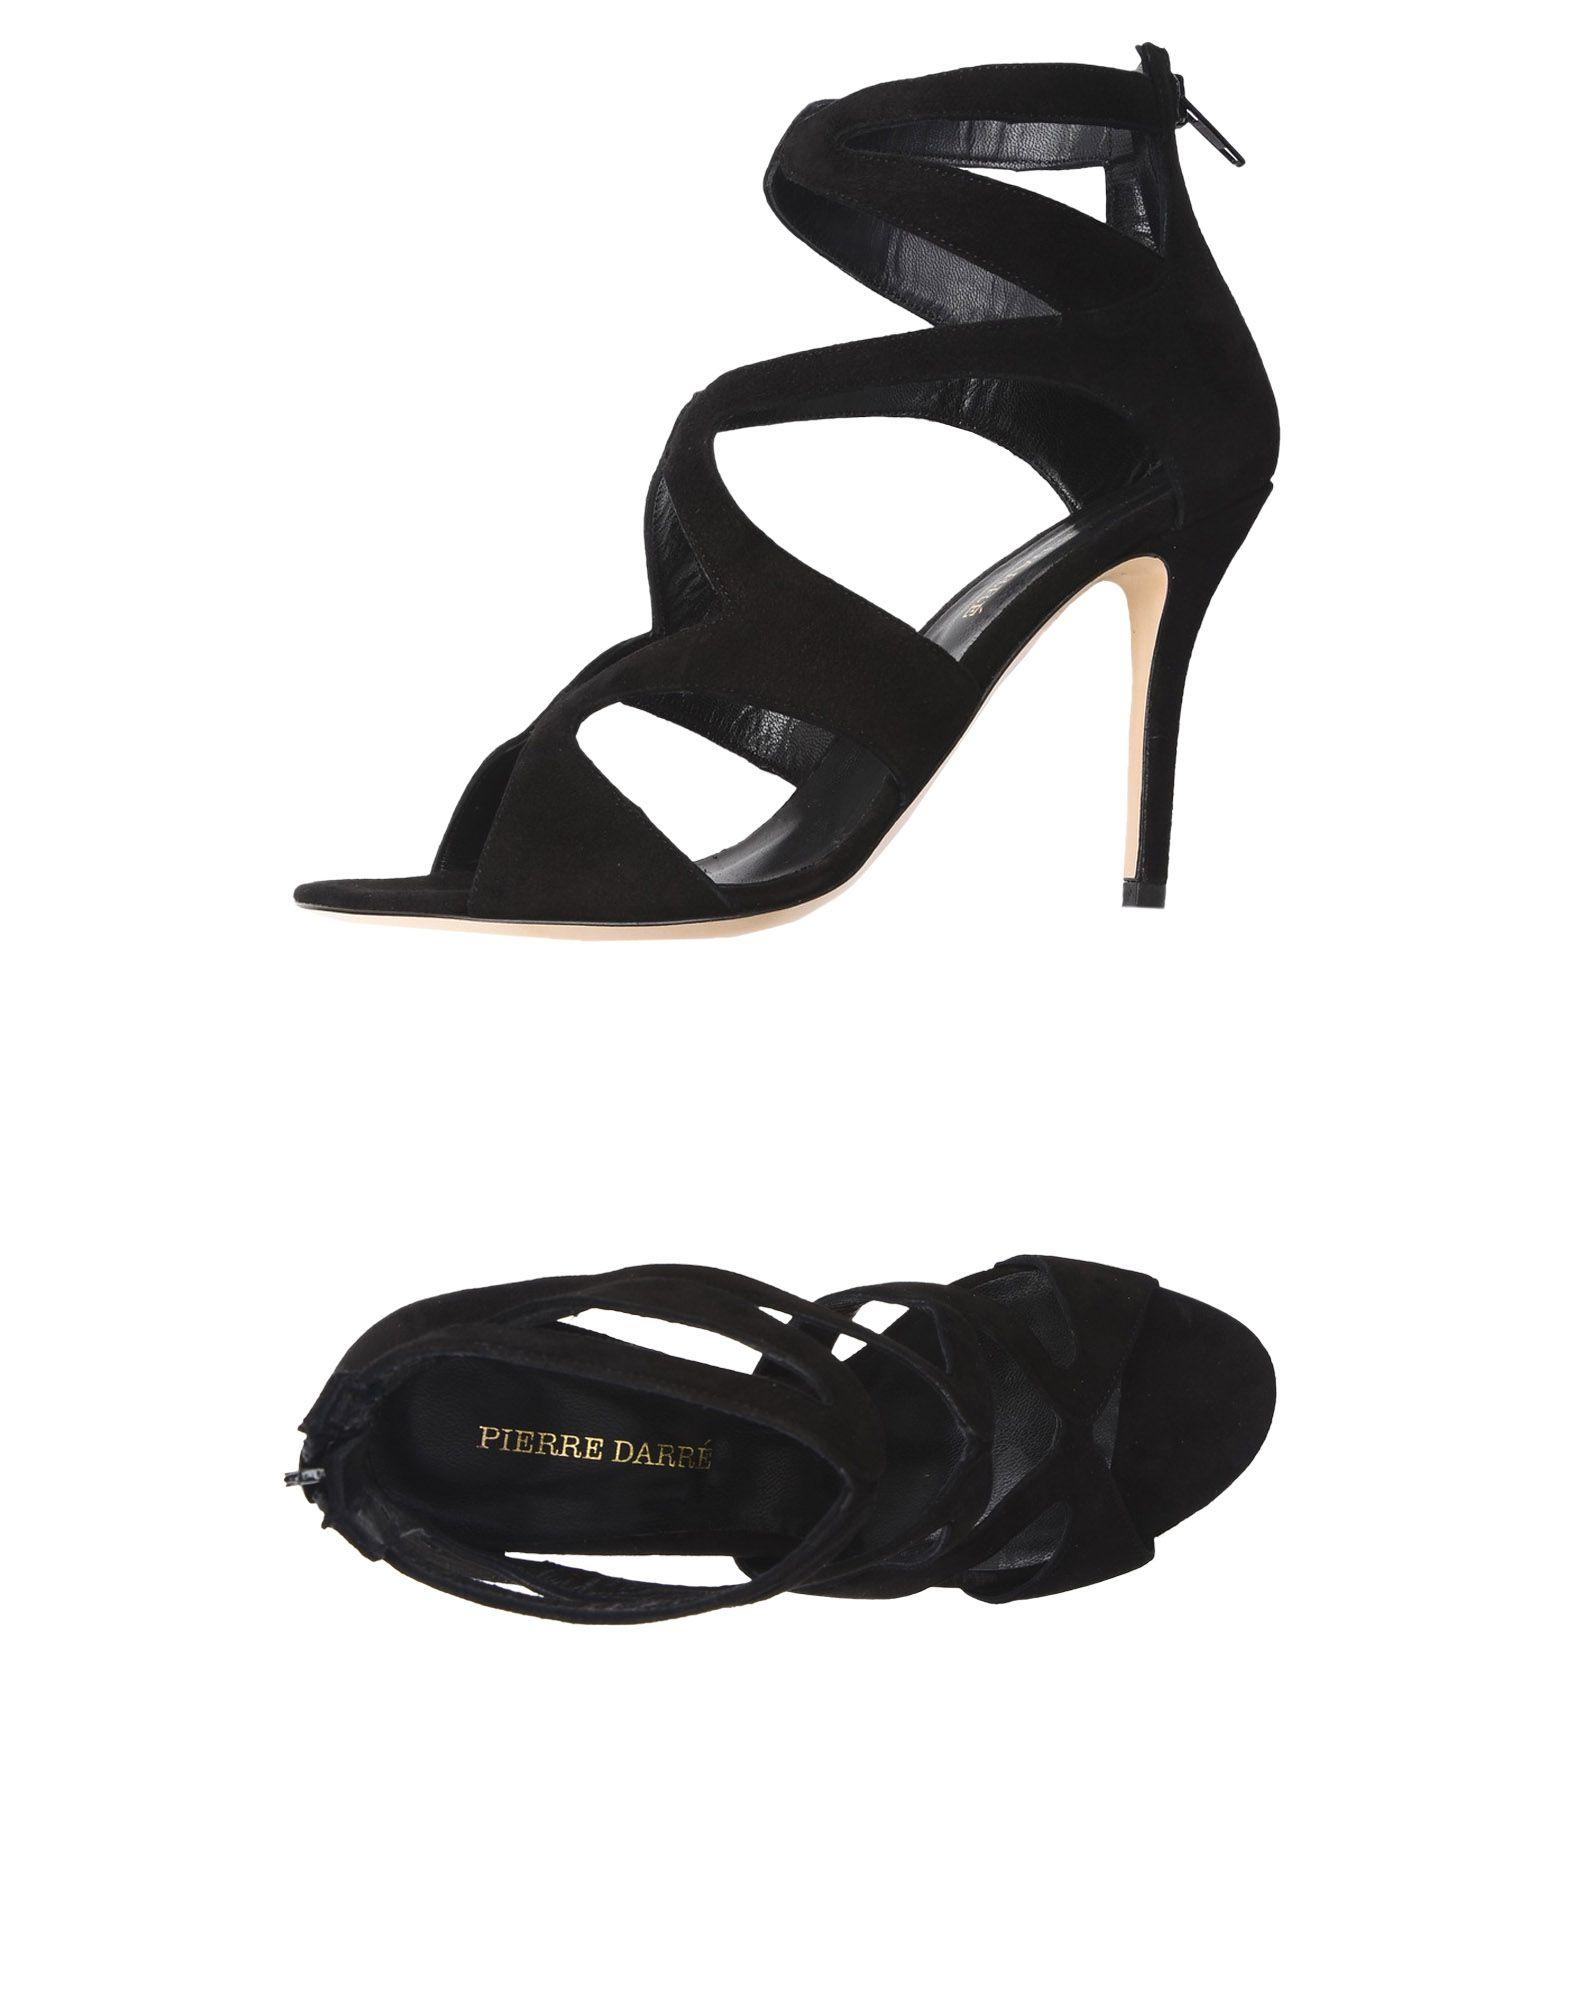 Pierre Darré Sandalen Damen  11244875WD Gute Qualität beliebte Schuhe